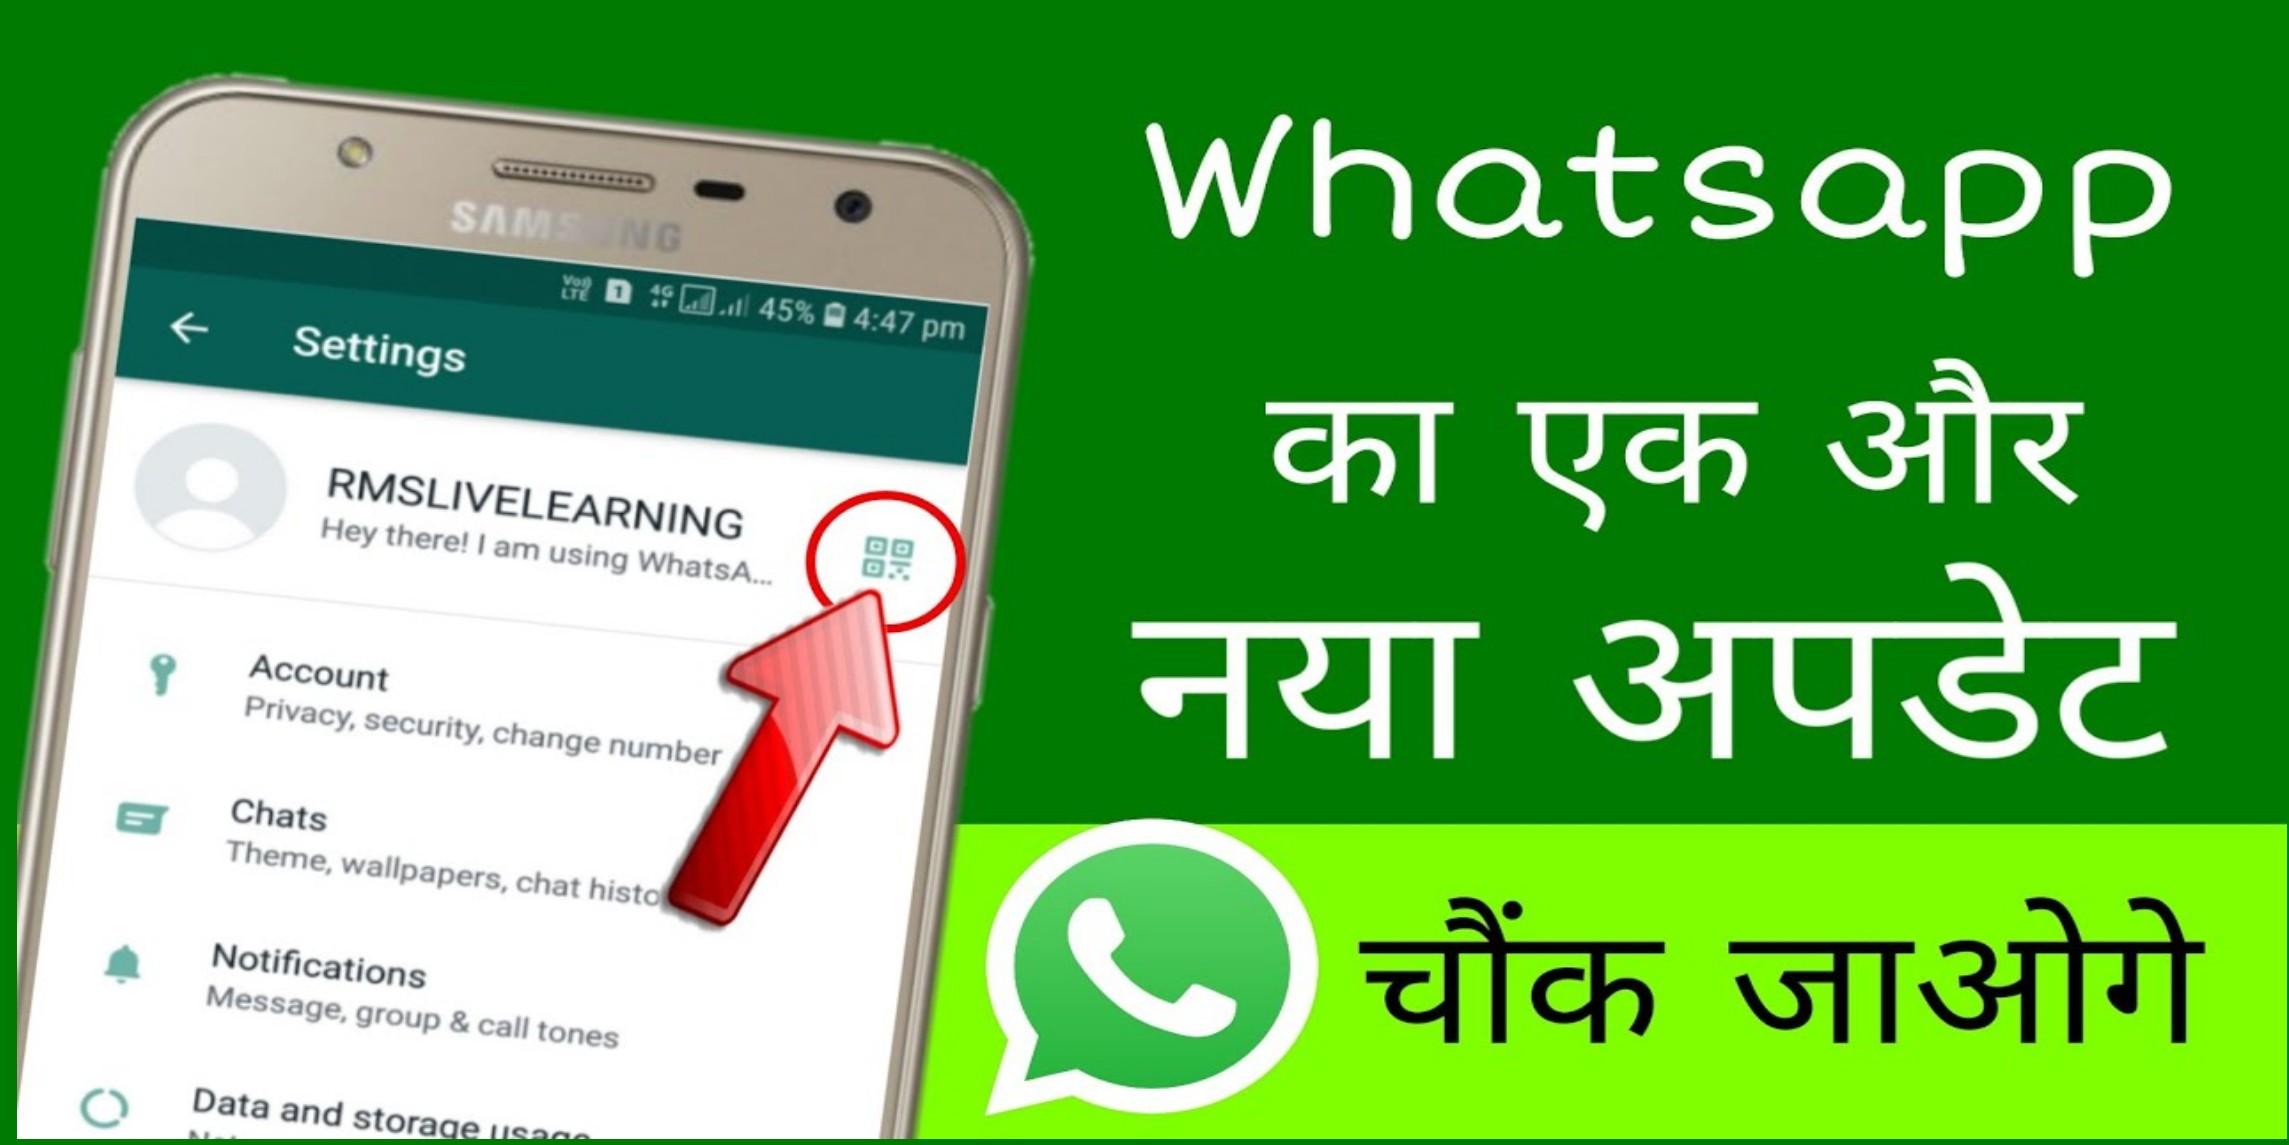 Whatsapp New Update – Kisi Ko Bhi Add Kare Without Phone Number